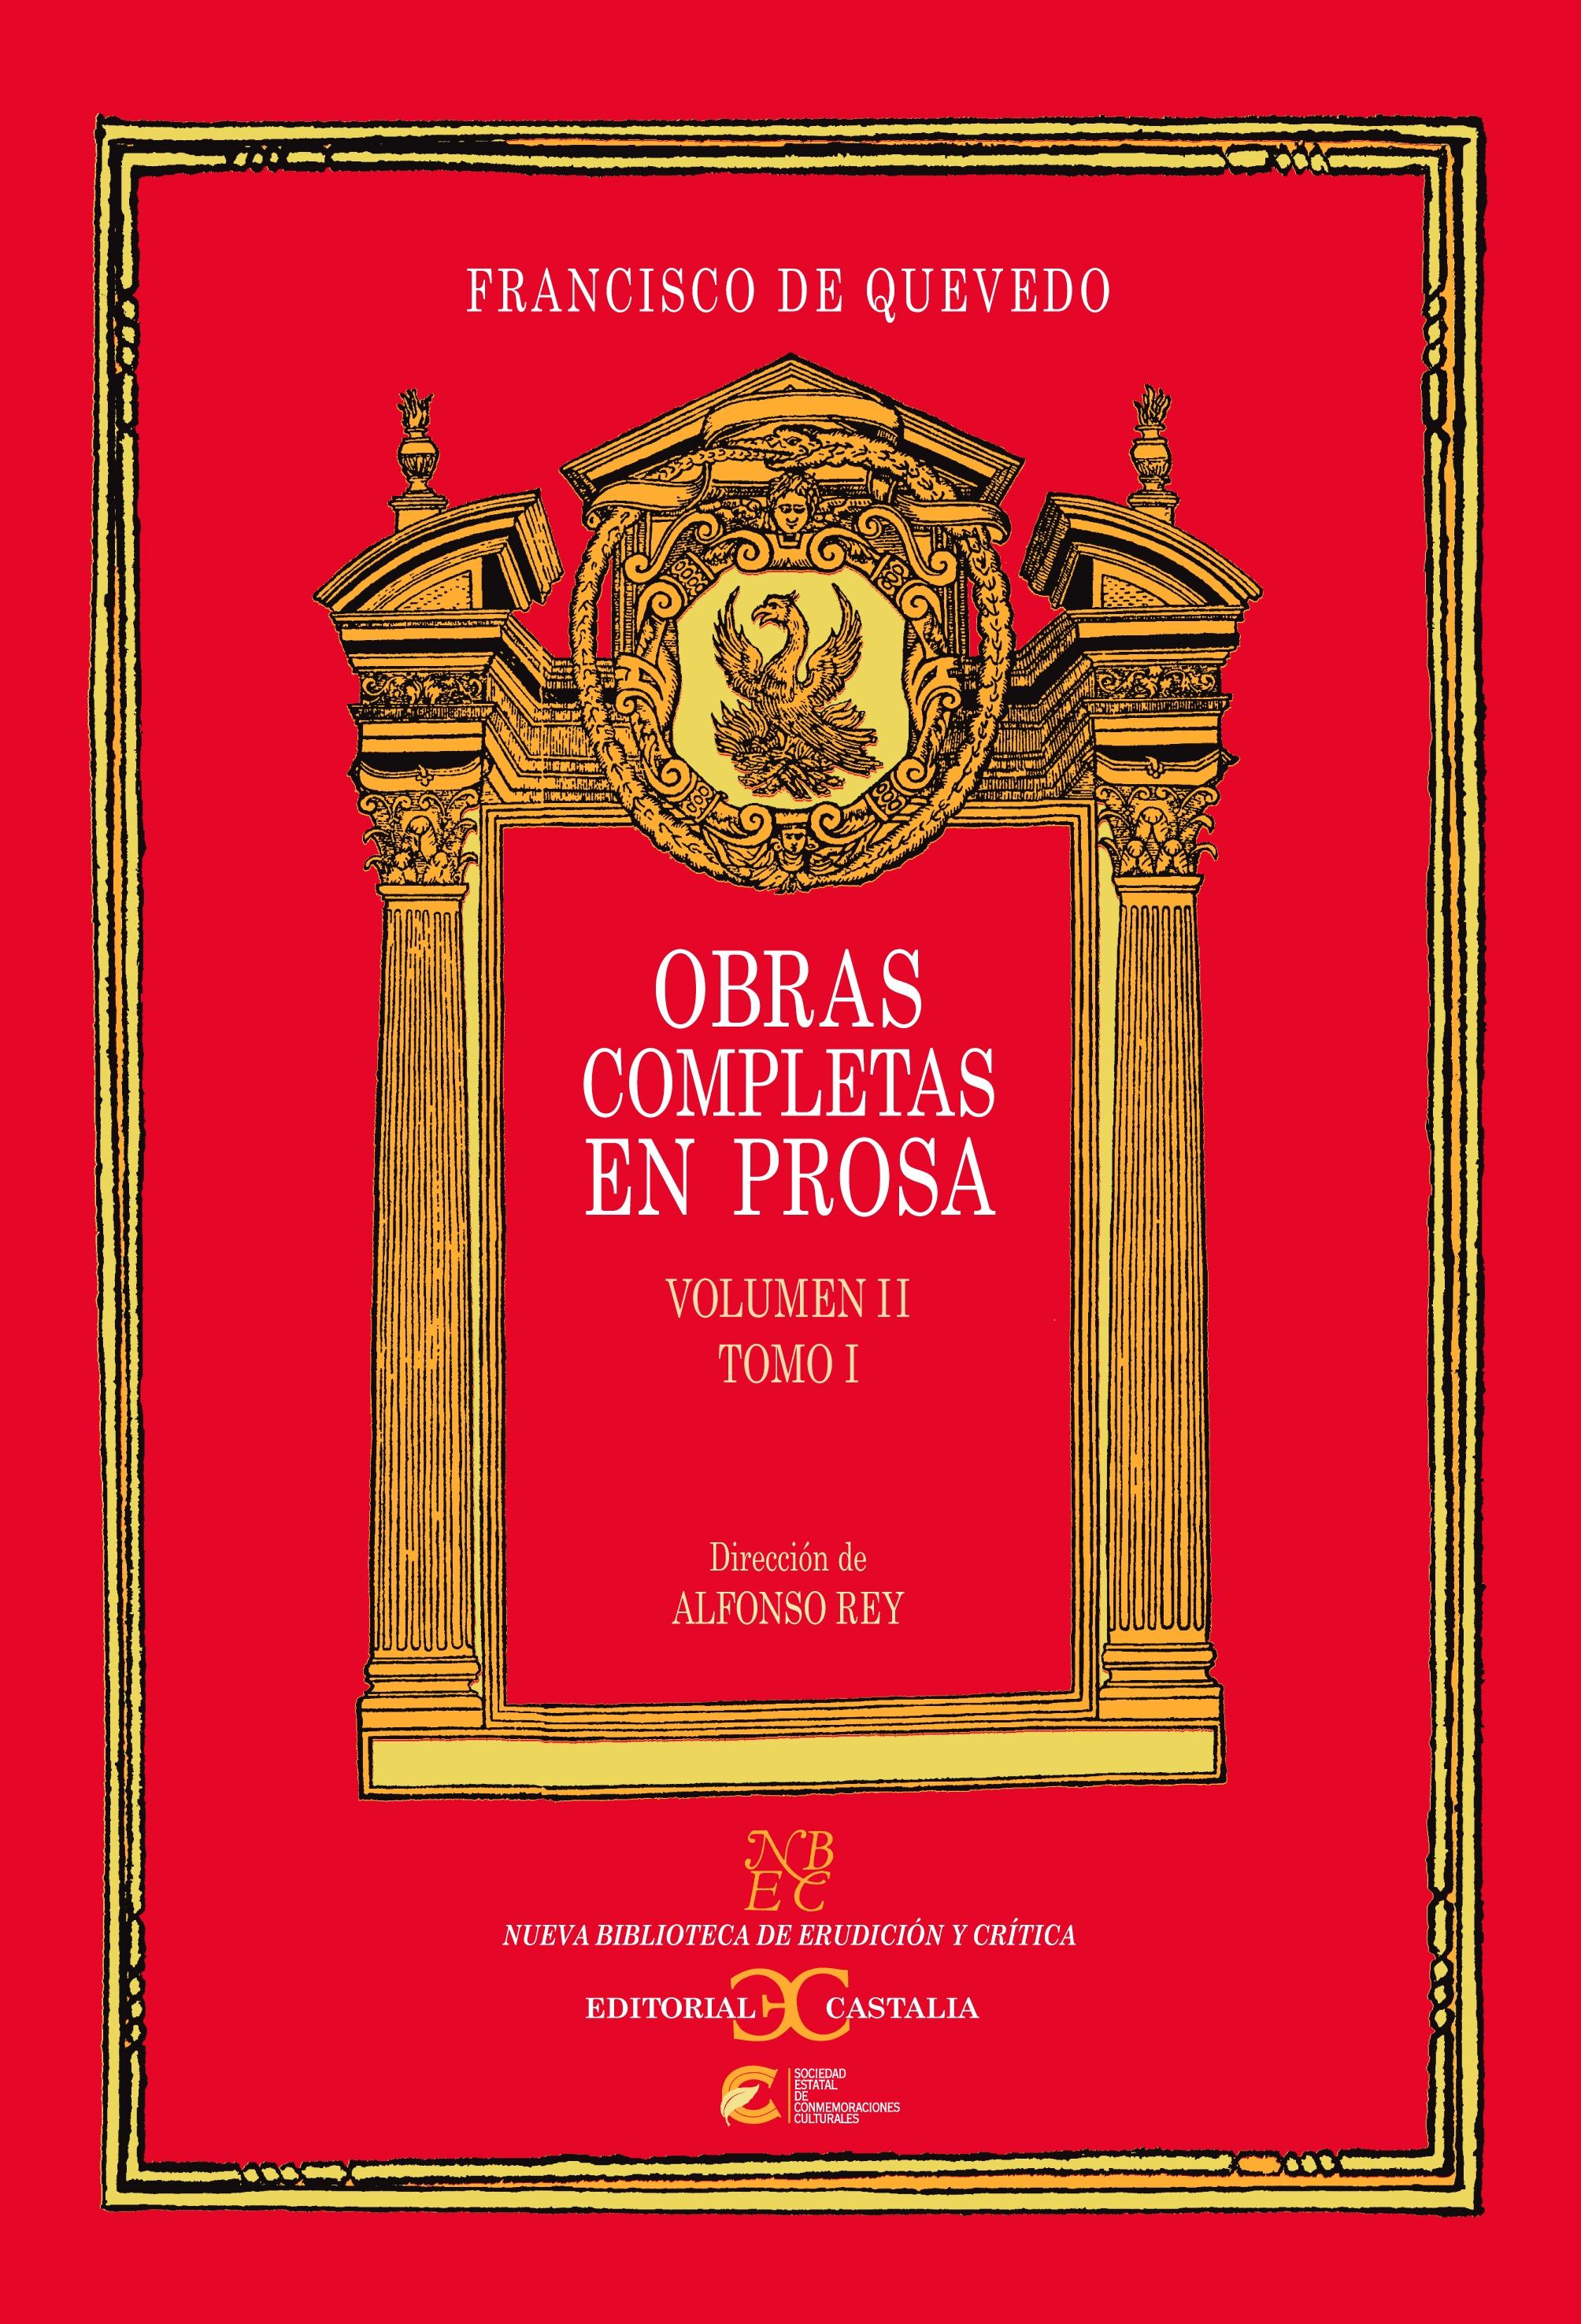 Obras completas en Prosa. Volumen II, Tomo I